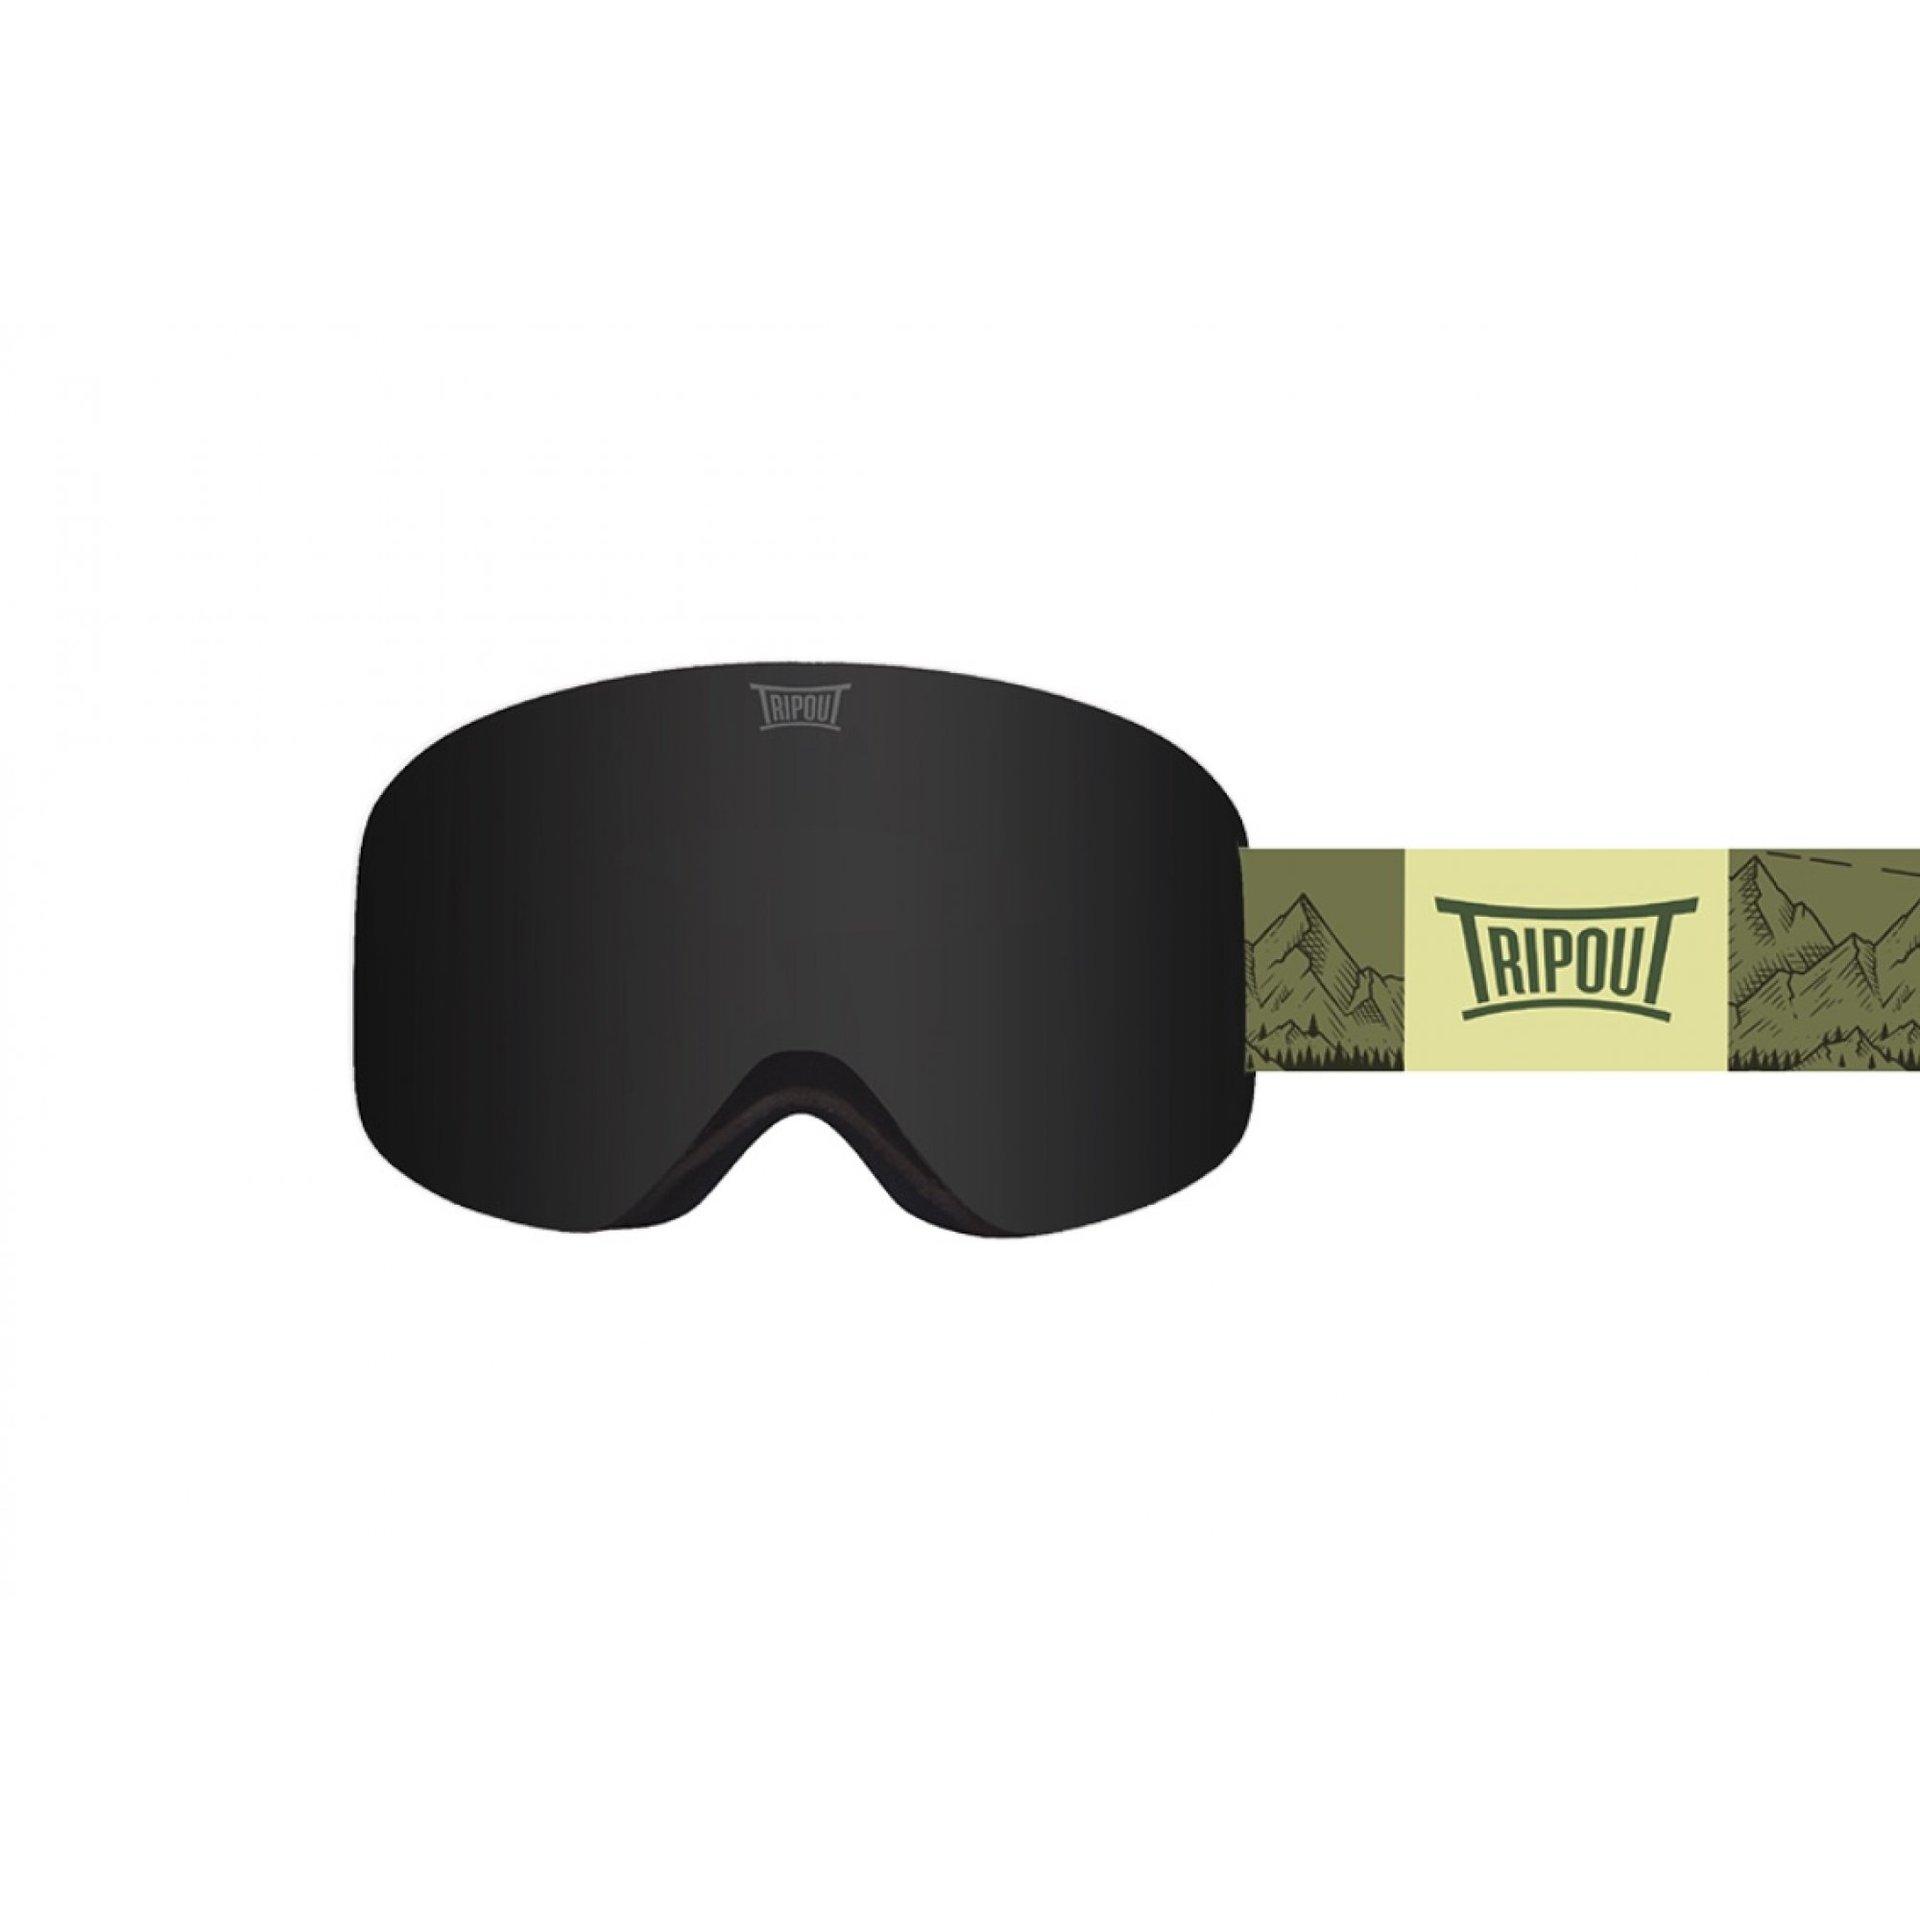 GOGLE TRIPOUT RACER MOUNT GREEN|BLACK POLARIZED+CLEAR 1